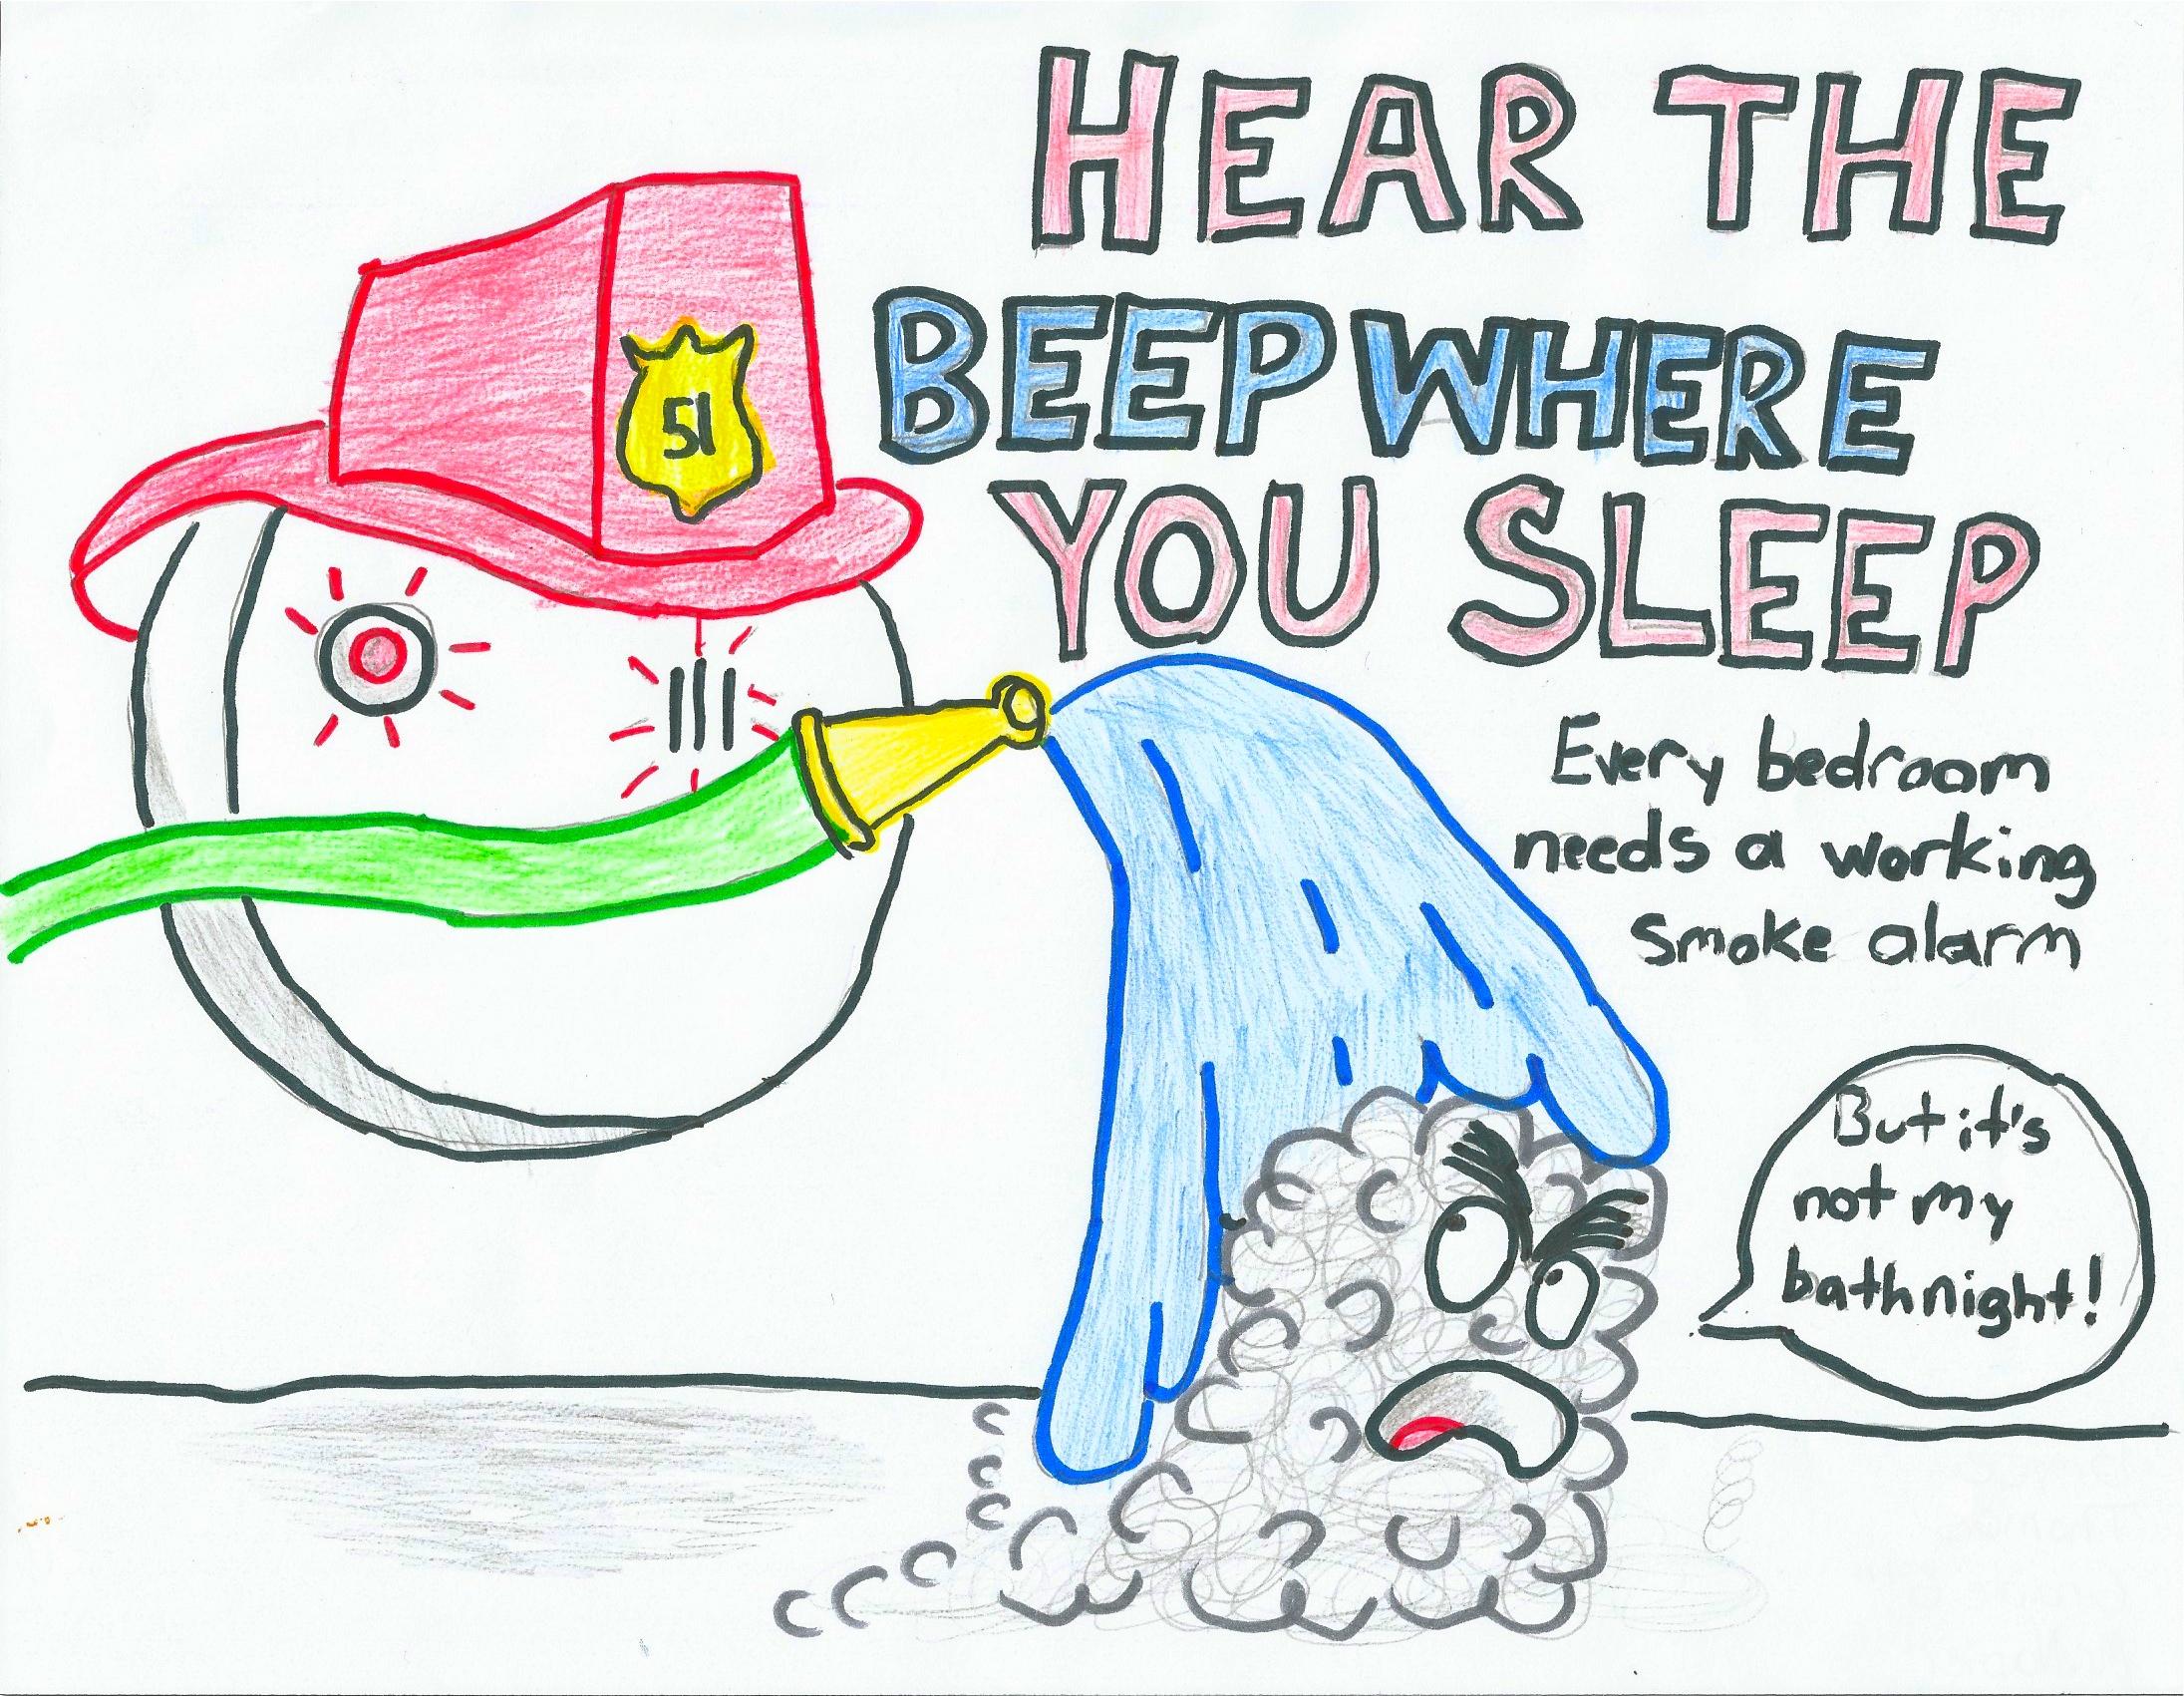 Listen Fire Safety : Fire safety poster contest artmanews